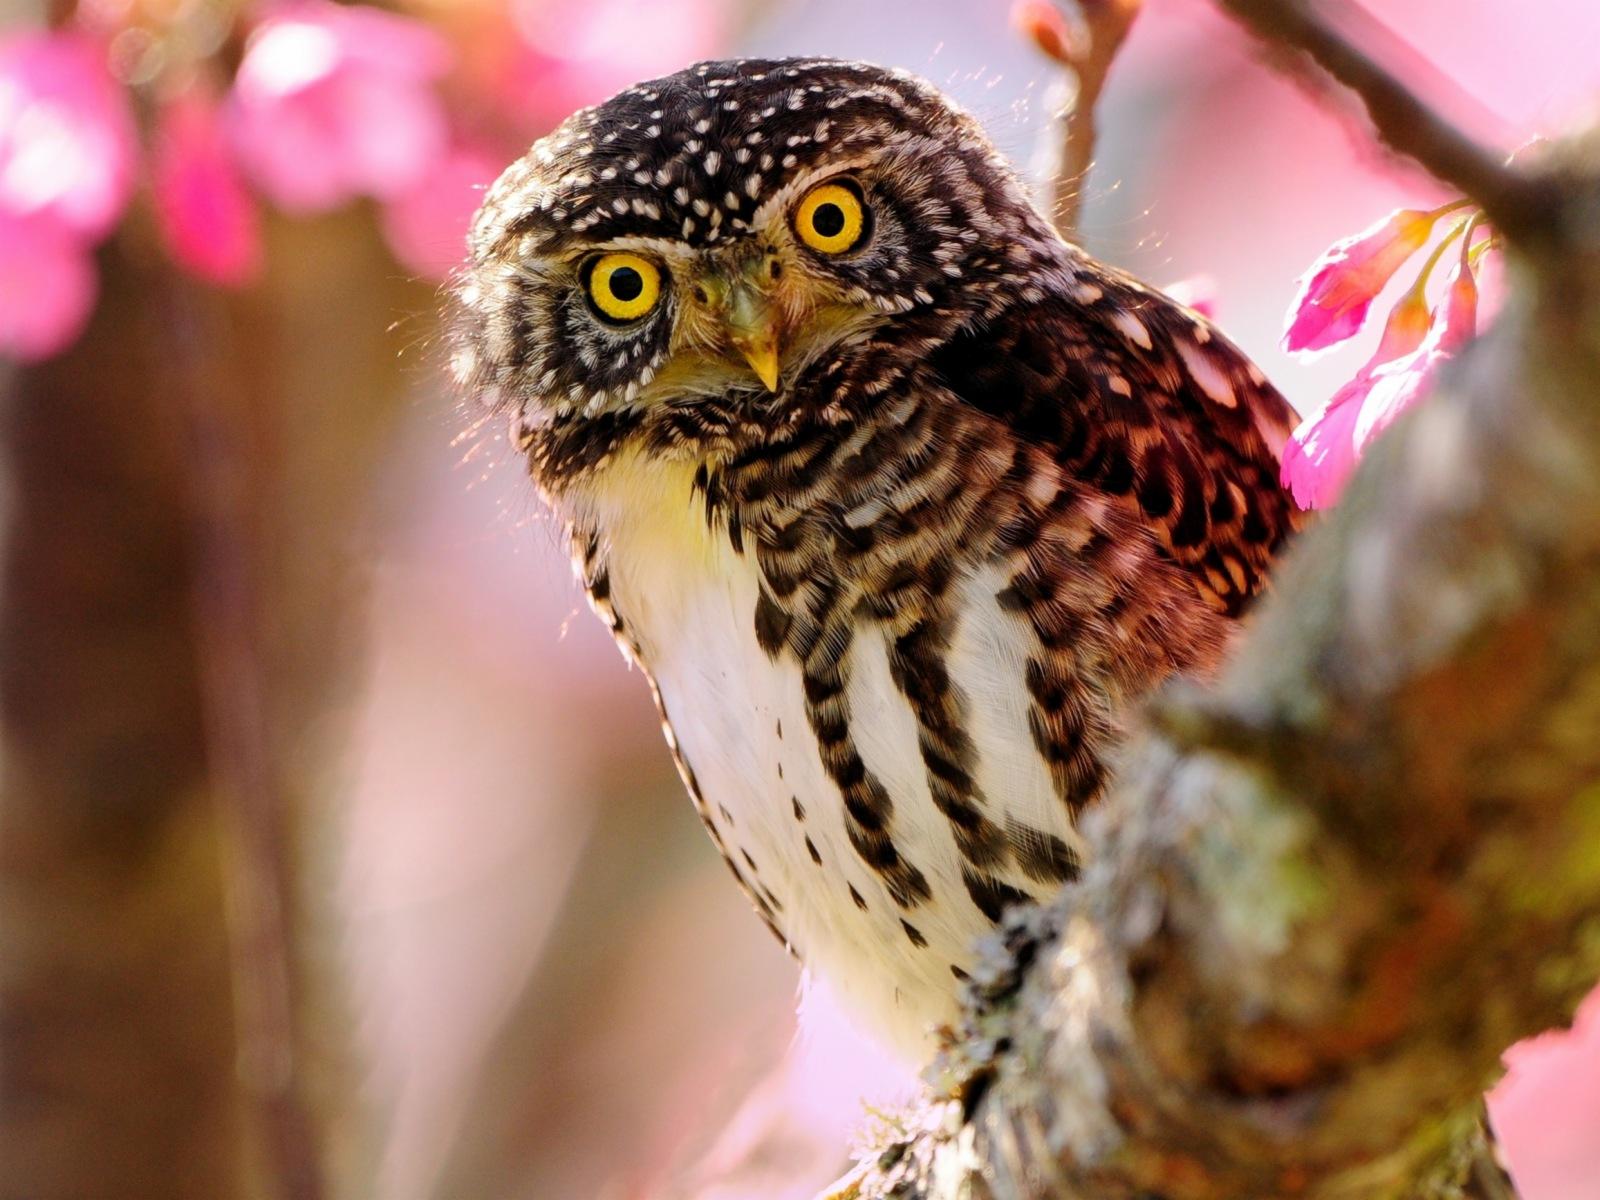 Hintergrundbilder Eulen Vögel Tiere